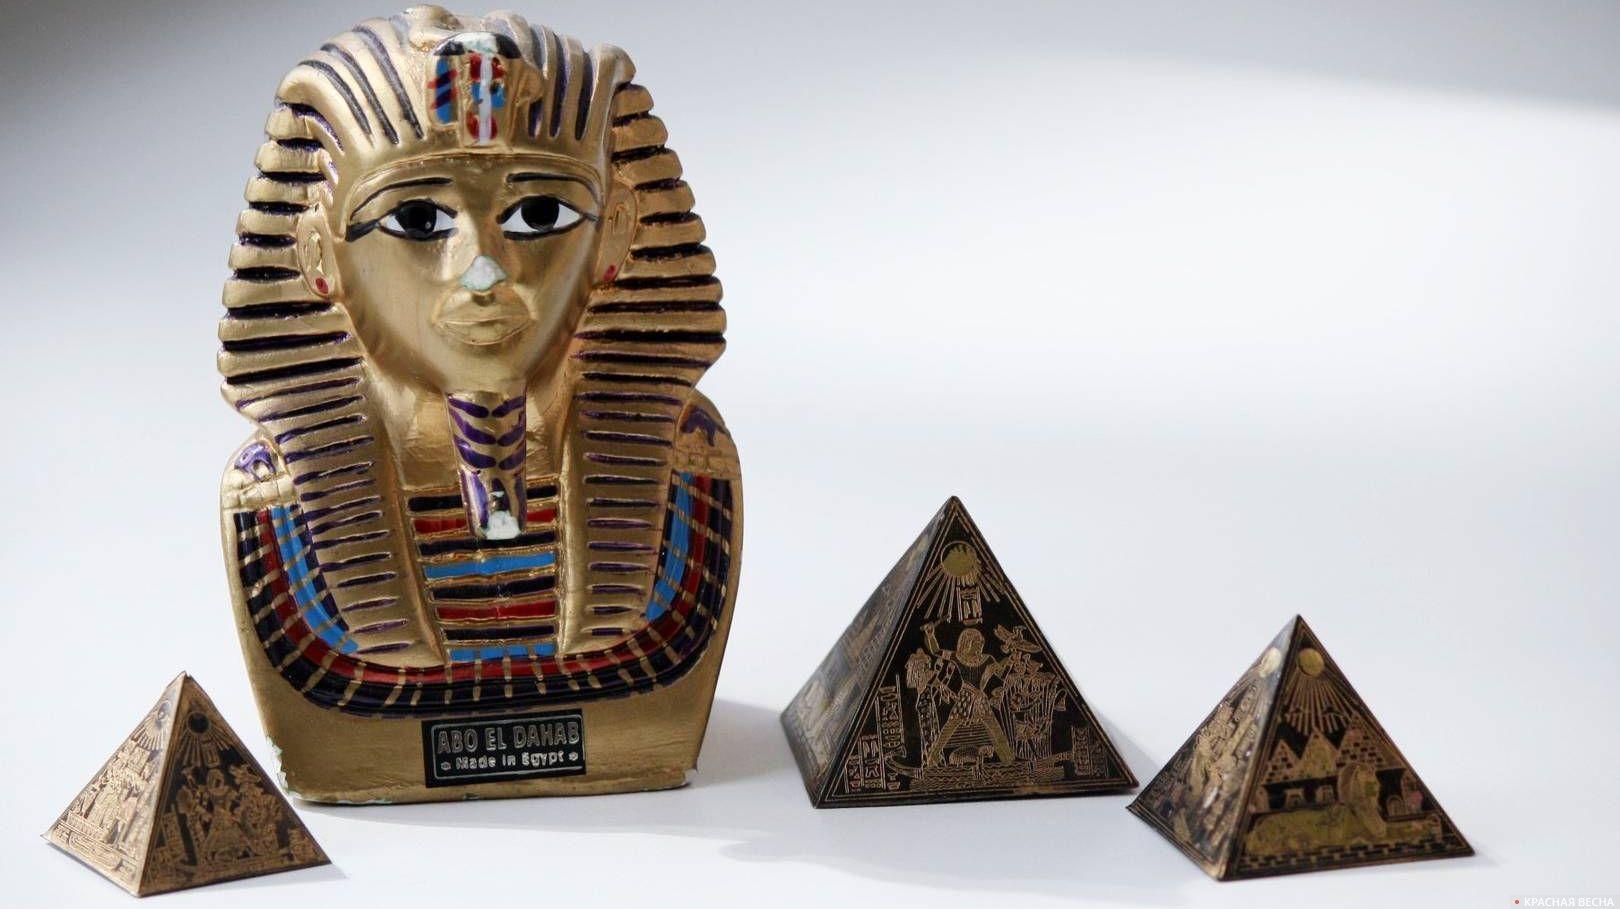 Фигурка фараона и египетские пирамиды